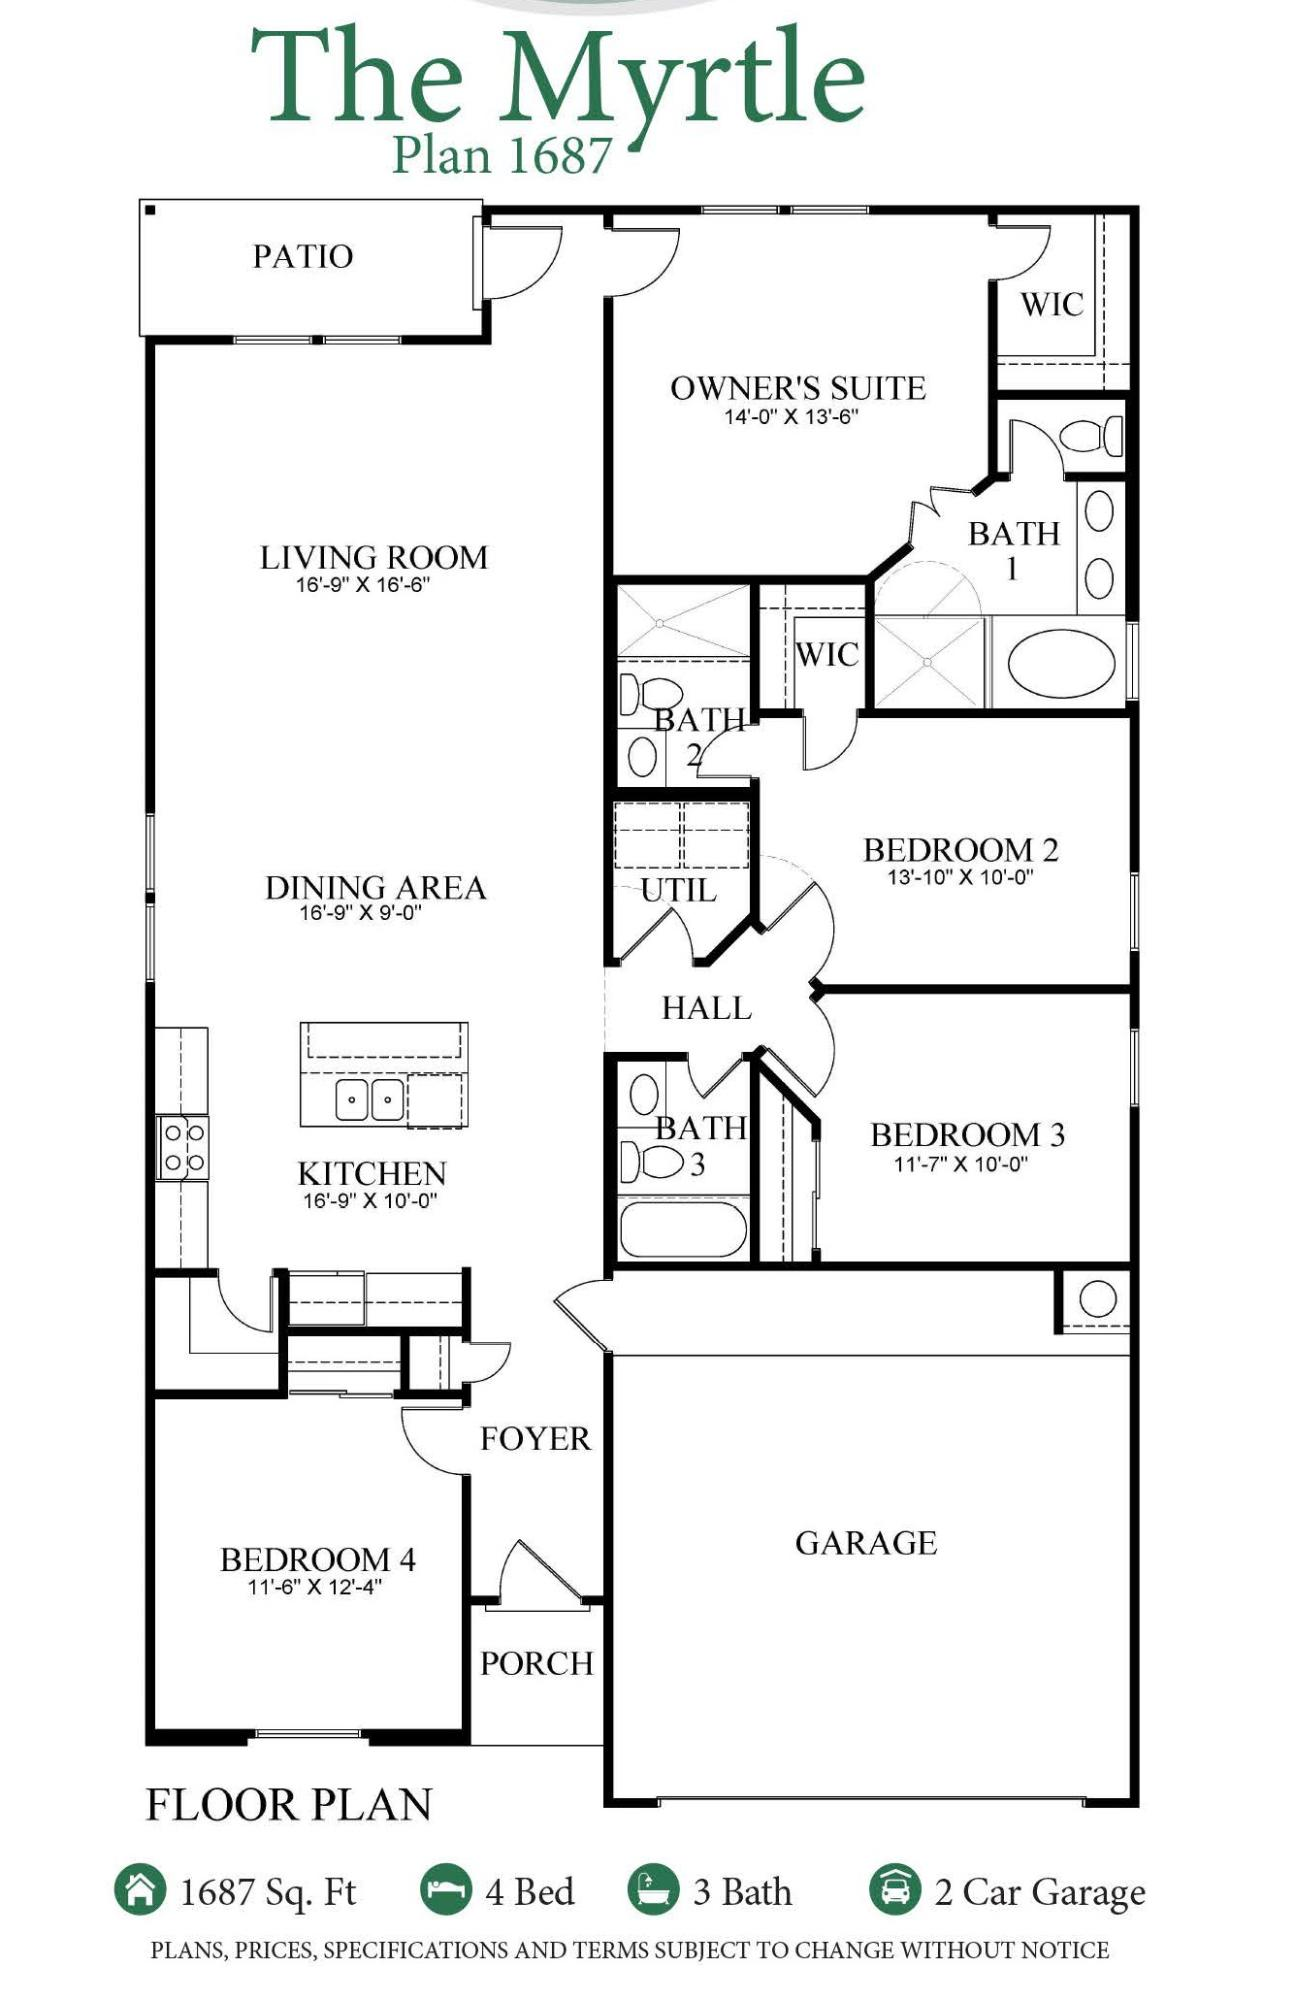 Myrtle Floorplan